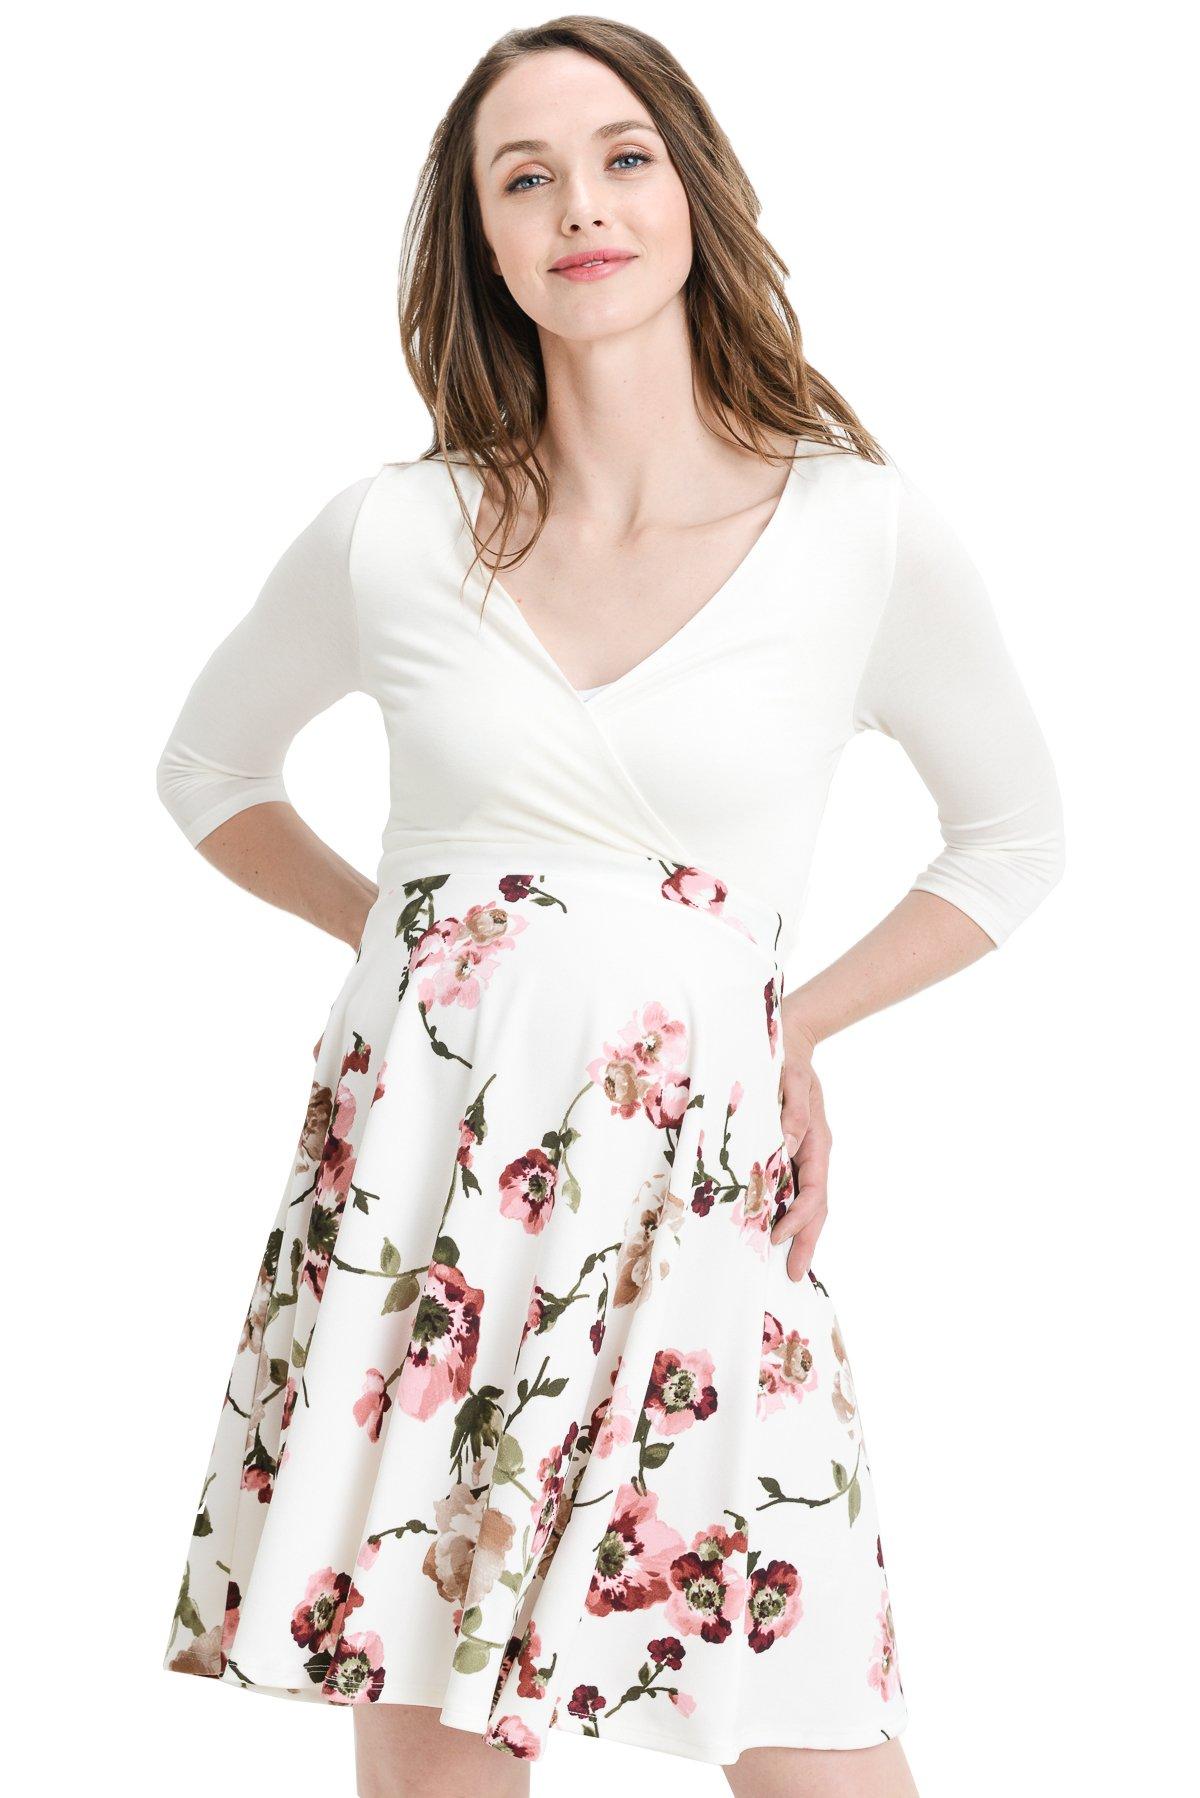 Hello MIZ Elbow Sleeve V-Neck Color Block Flower Printed Maternity Nursing Skater Dress (Medium, Ivory/Blush Floral)